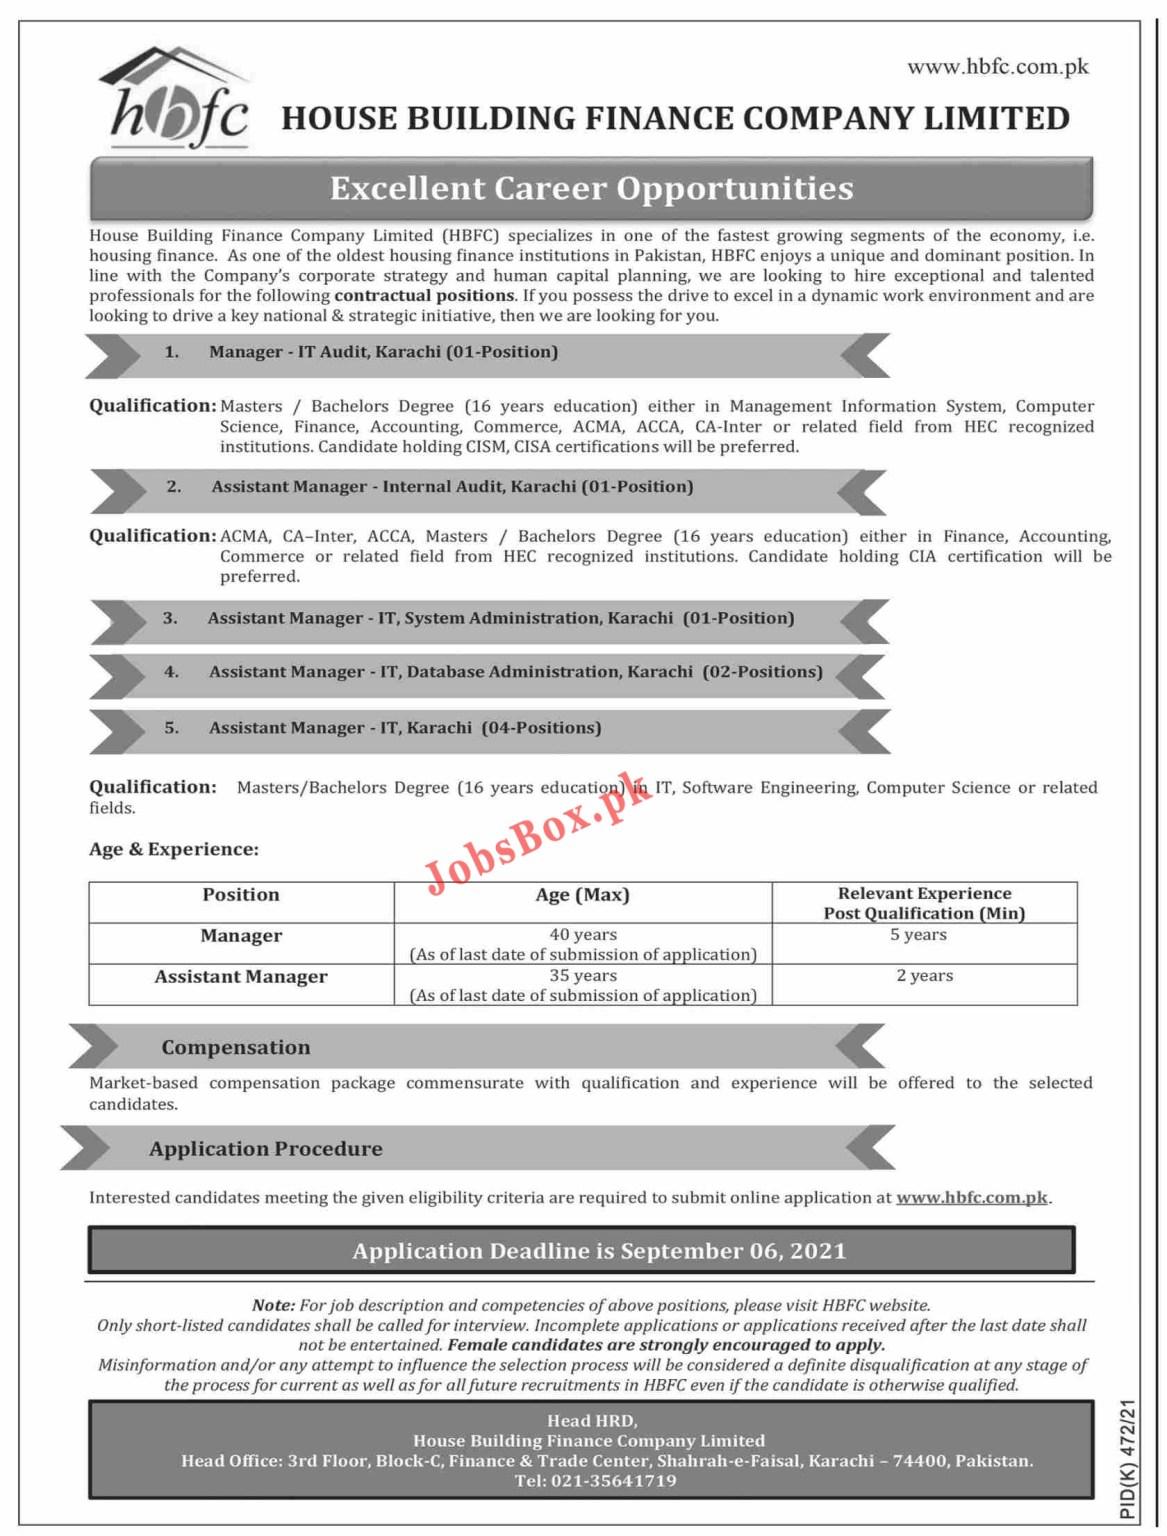 House Building Finance Company HBFC Jobs 2021- Apply via www.hbfc.com.pk